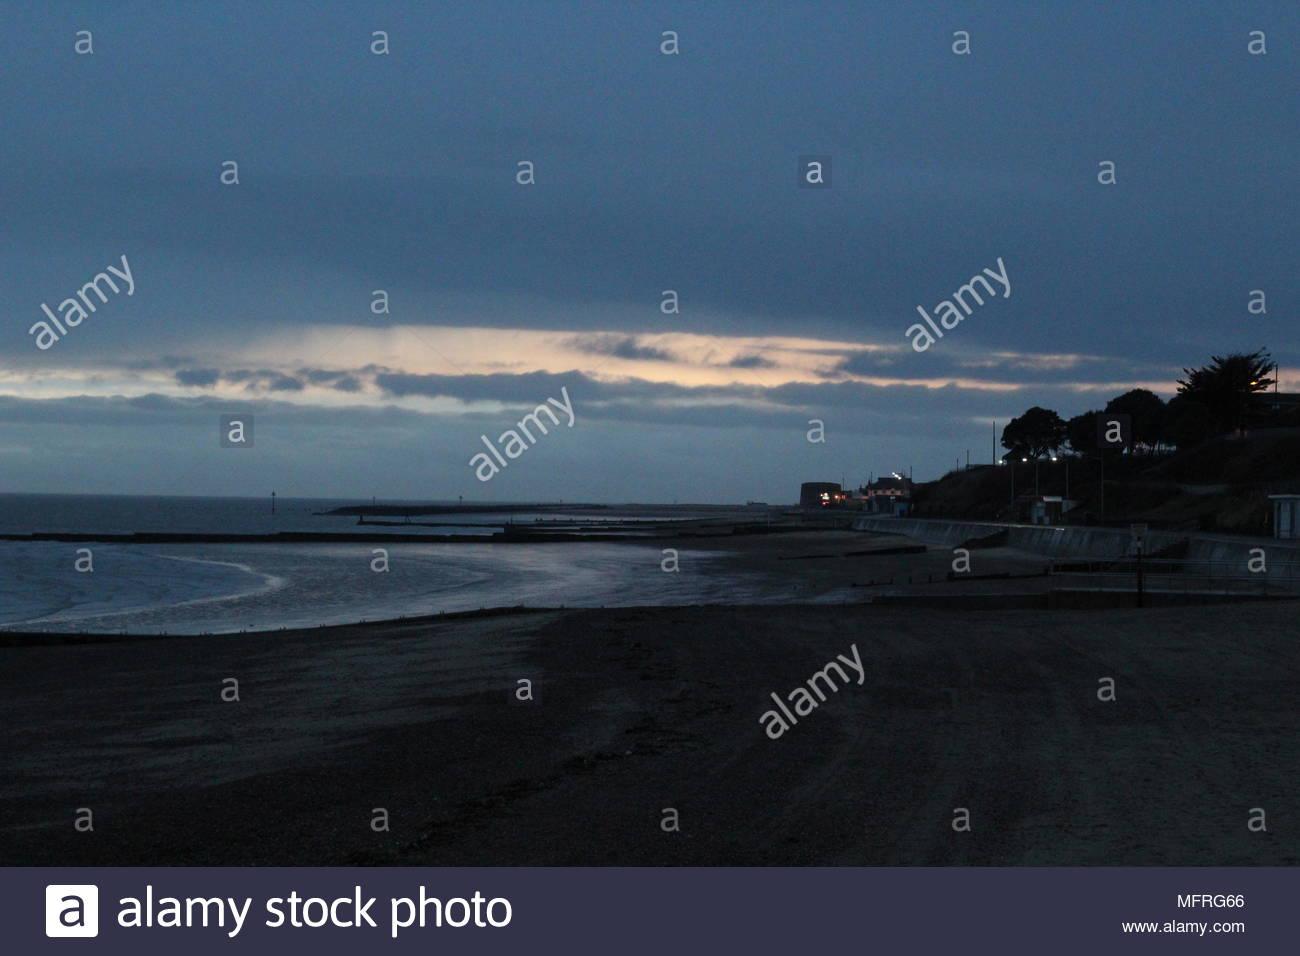 Clacton beach before dusk. Clacton, UK - Stock Image